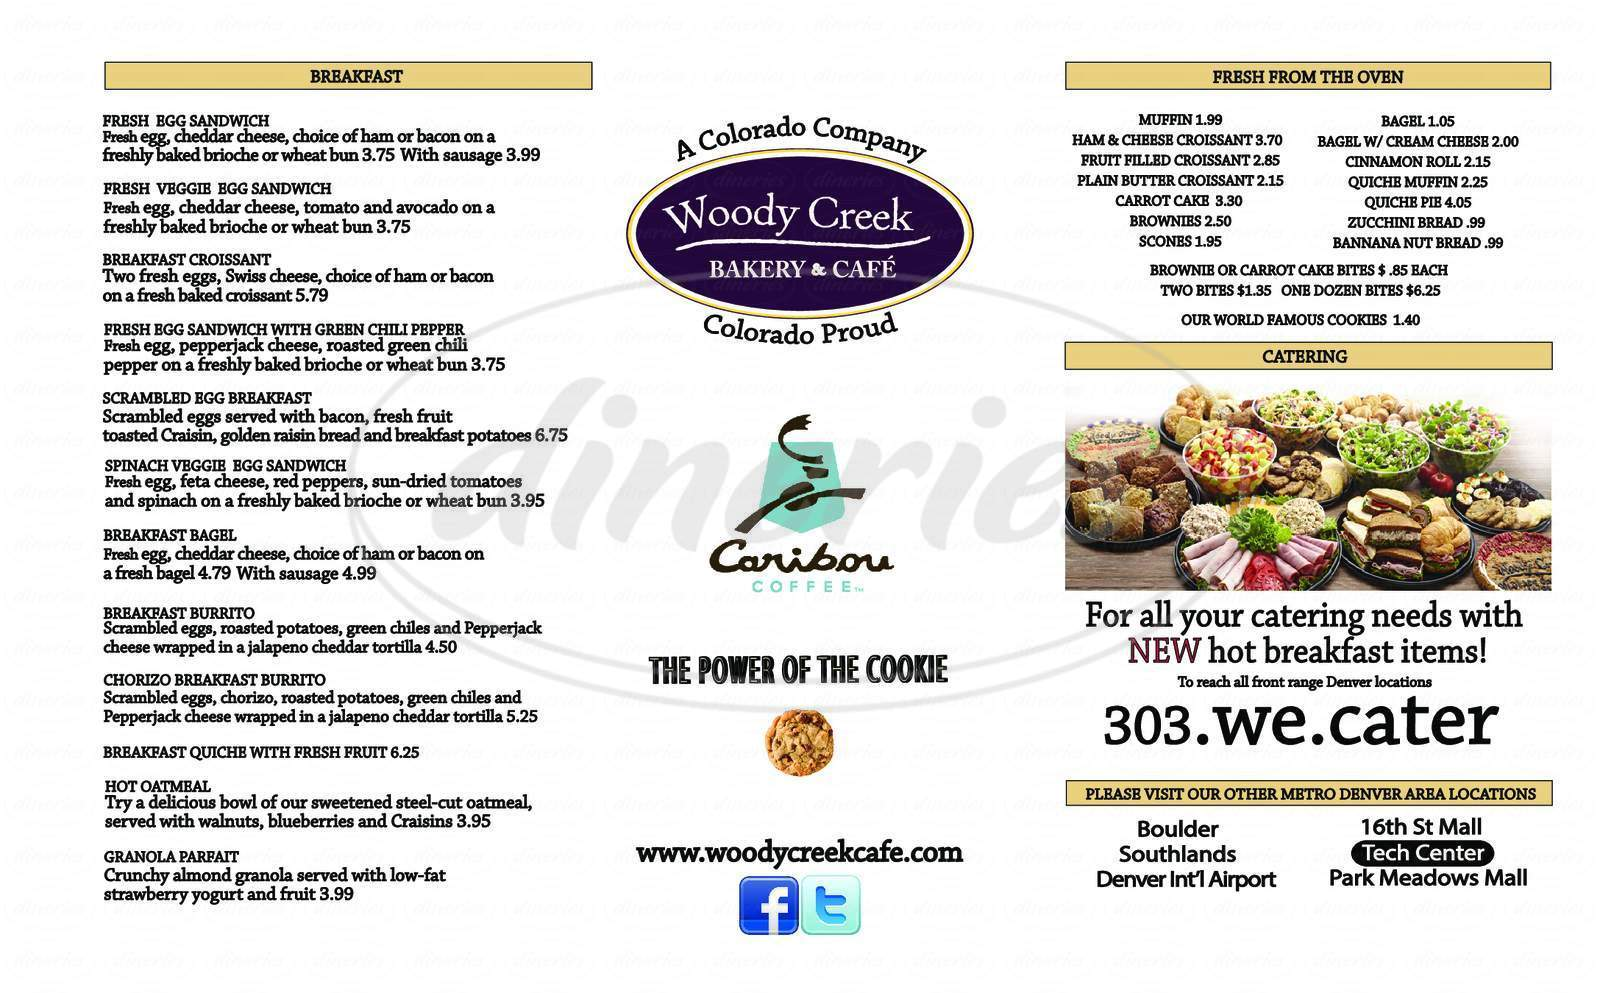 menu for Woody Creek Bakery & Cafe